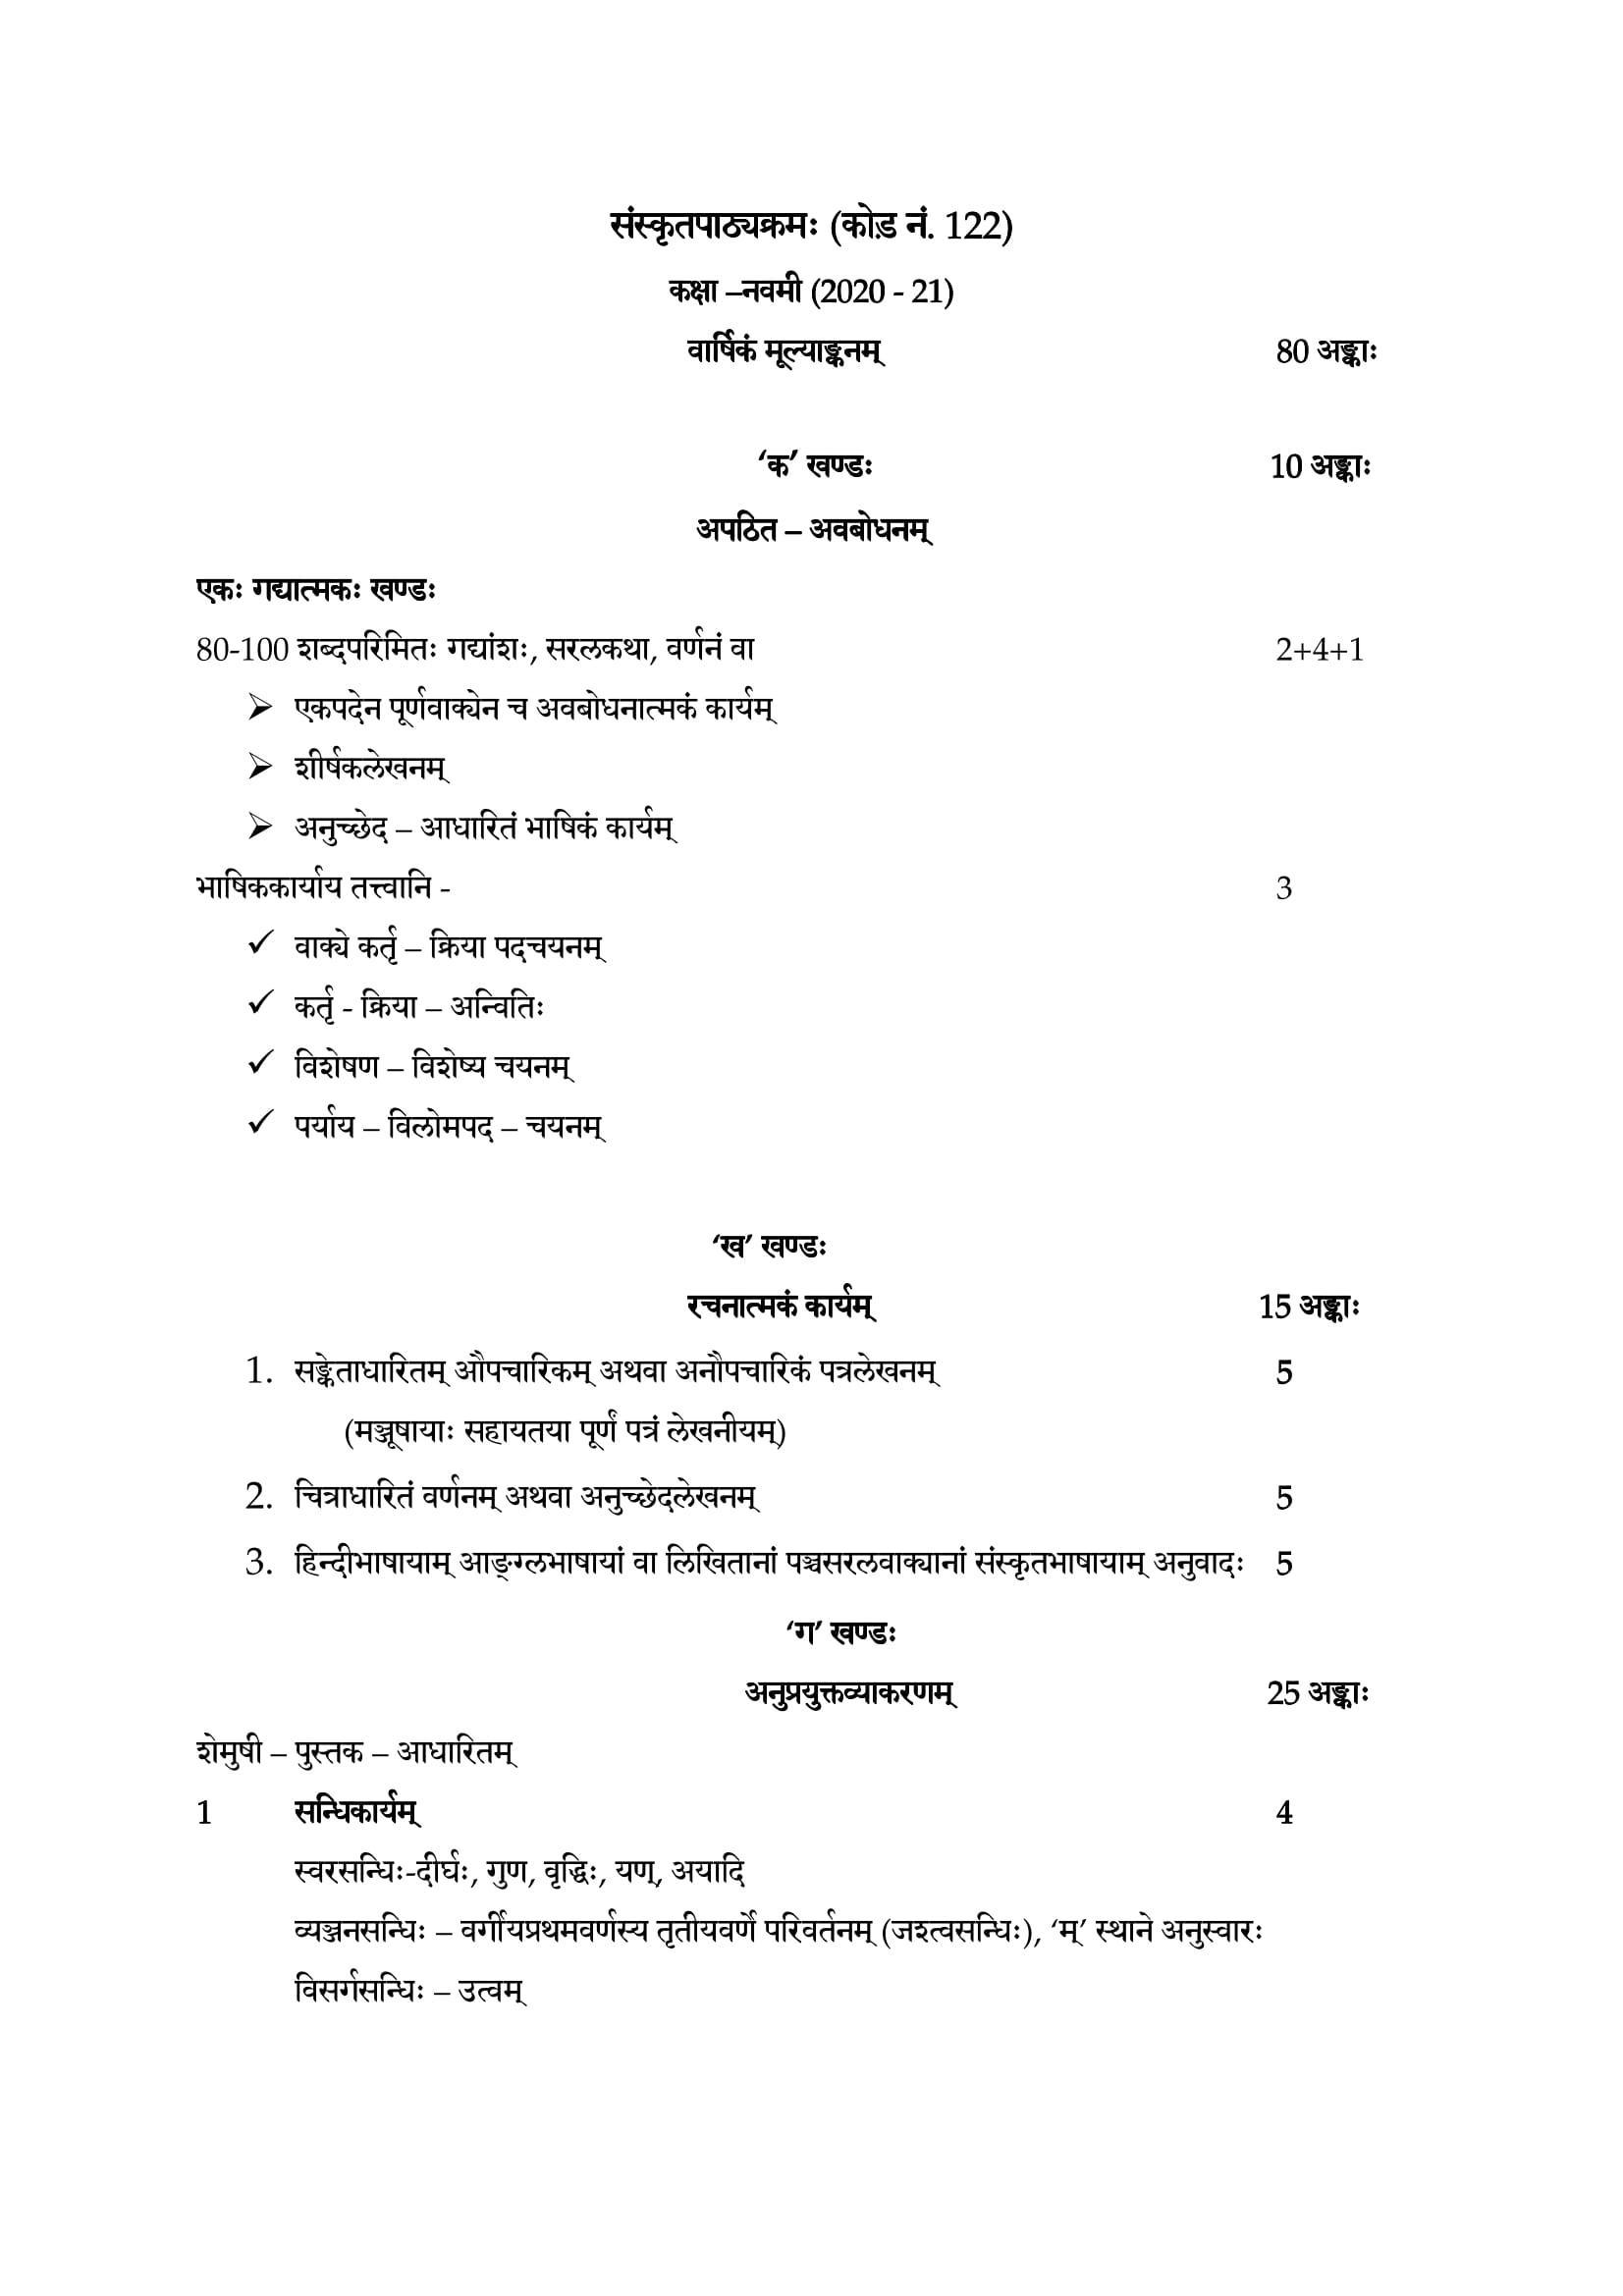 Sanskrit Sec 2020 21 class 9 10 10